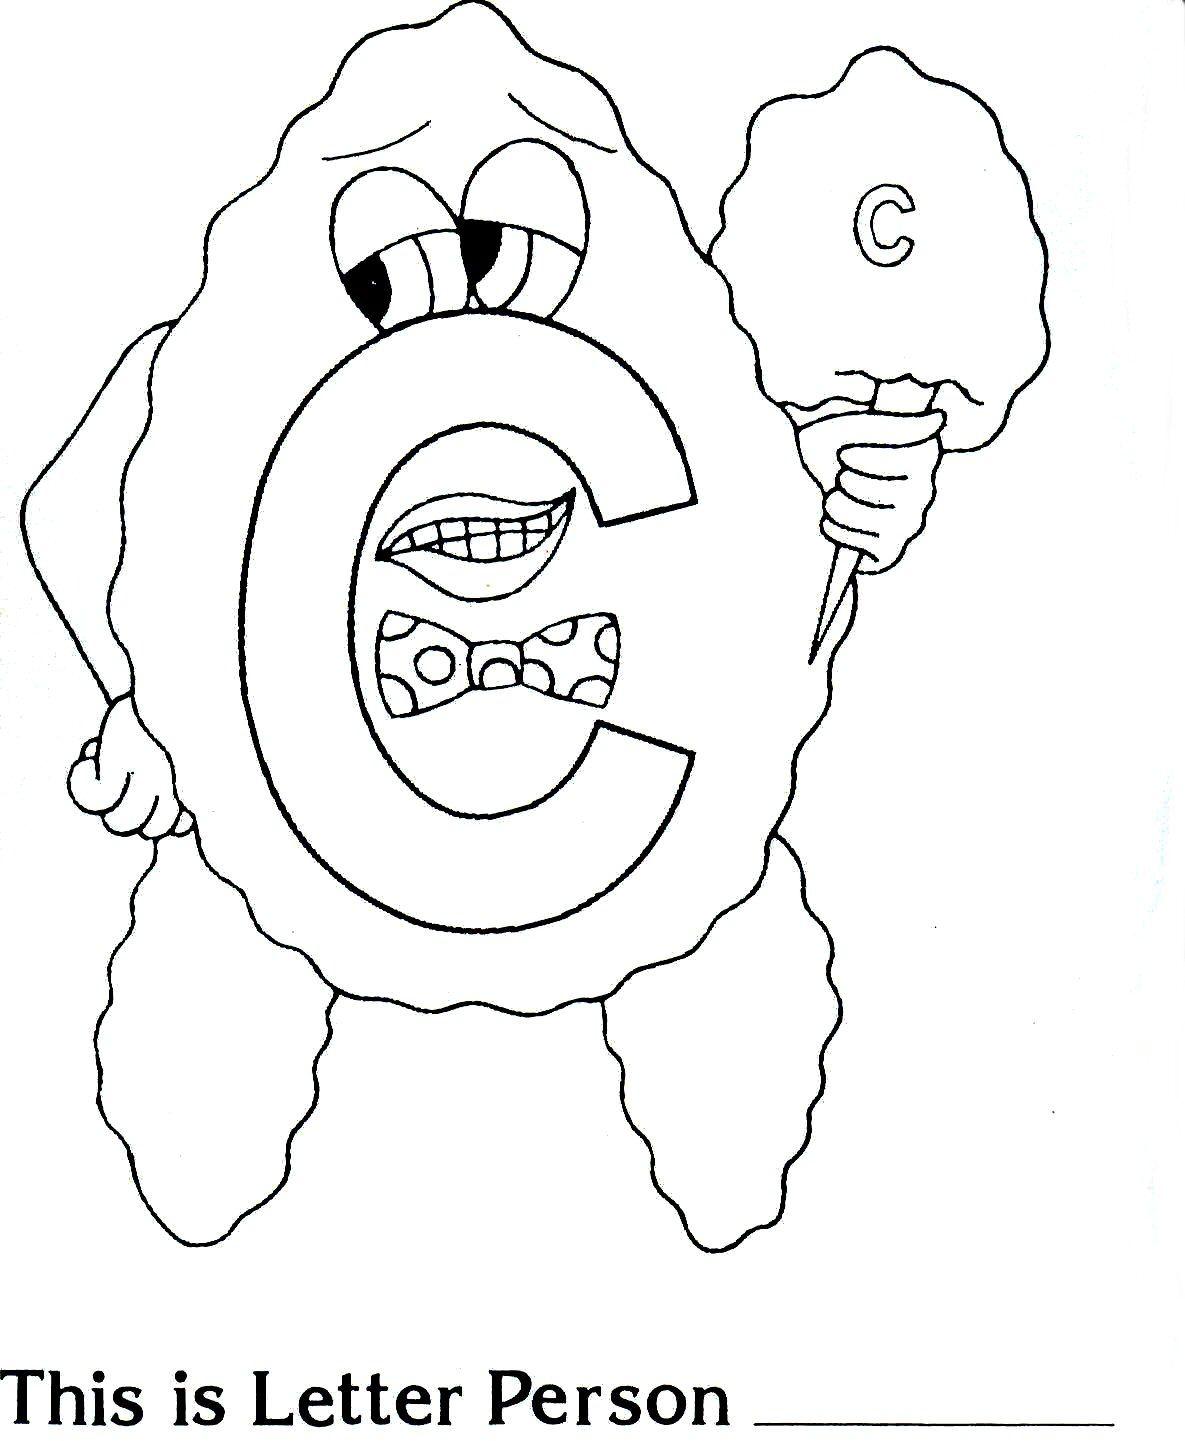 Brilliant Beginnings Preschool Letter Person C Coloring